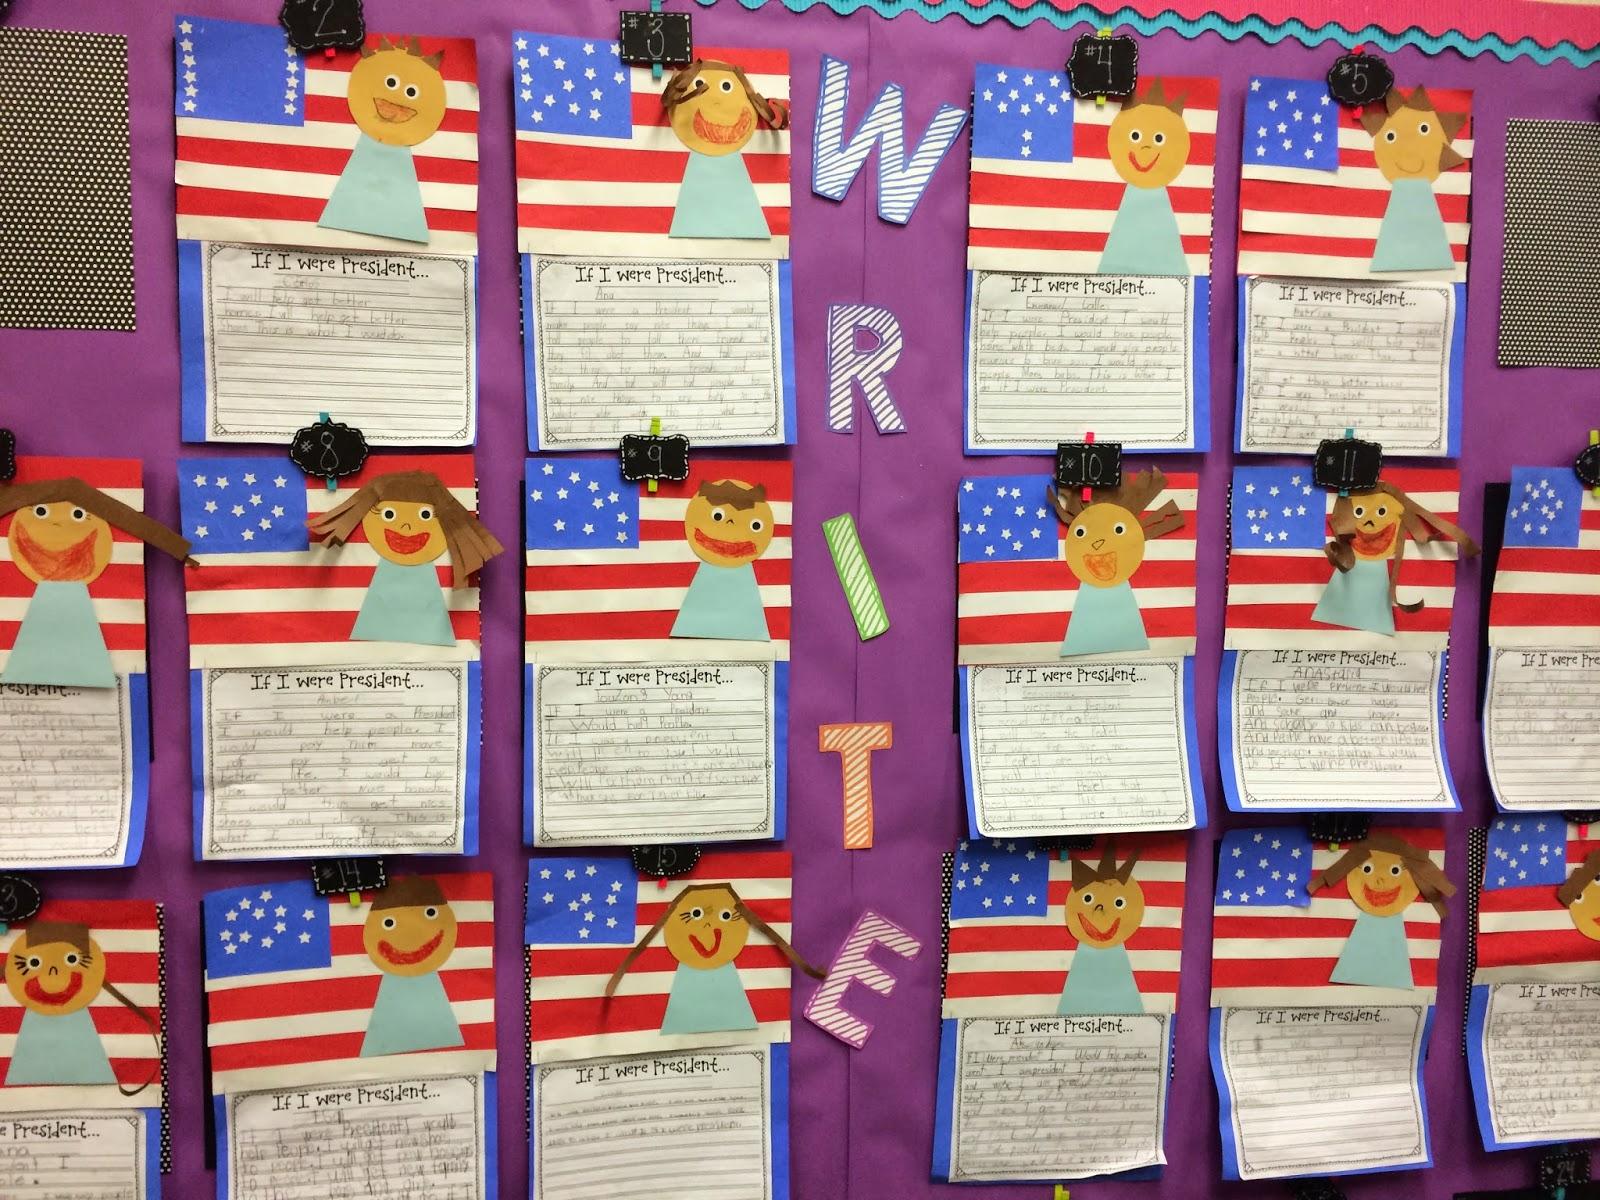 Mrs Peterson Loves to Teach Life of an ElementaryTeacher If I – If I Were President Worksheet